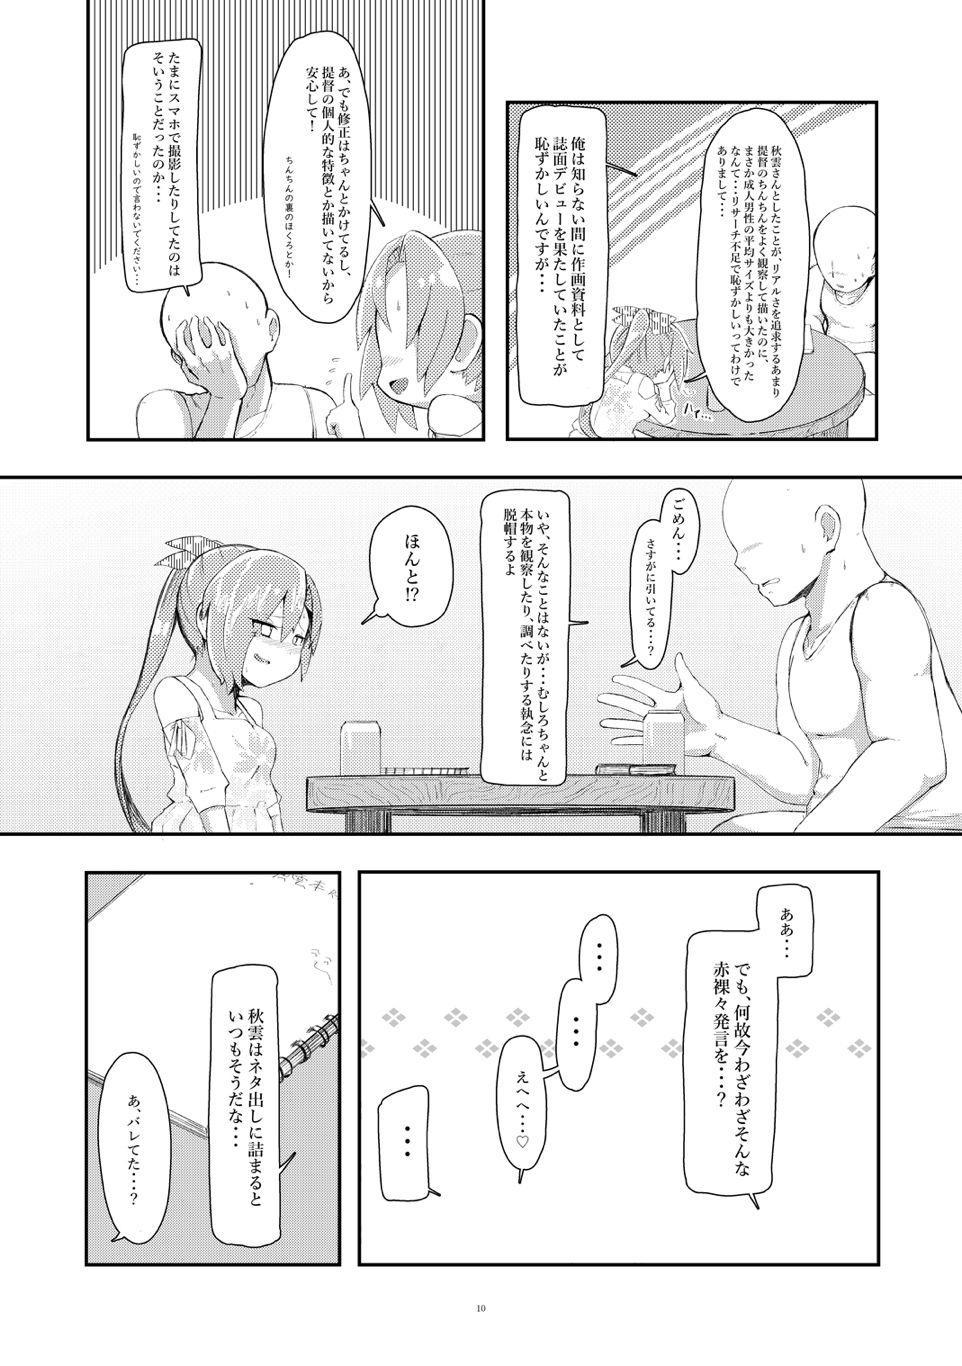 Hoshiwasure Misaki 8